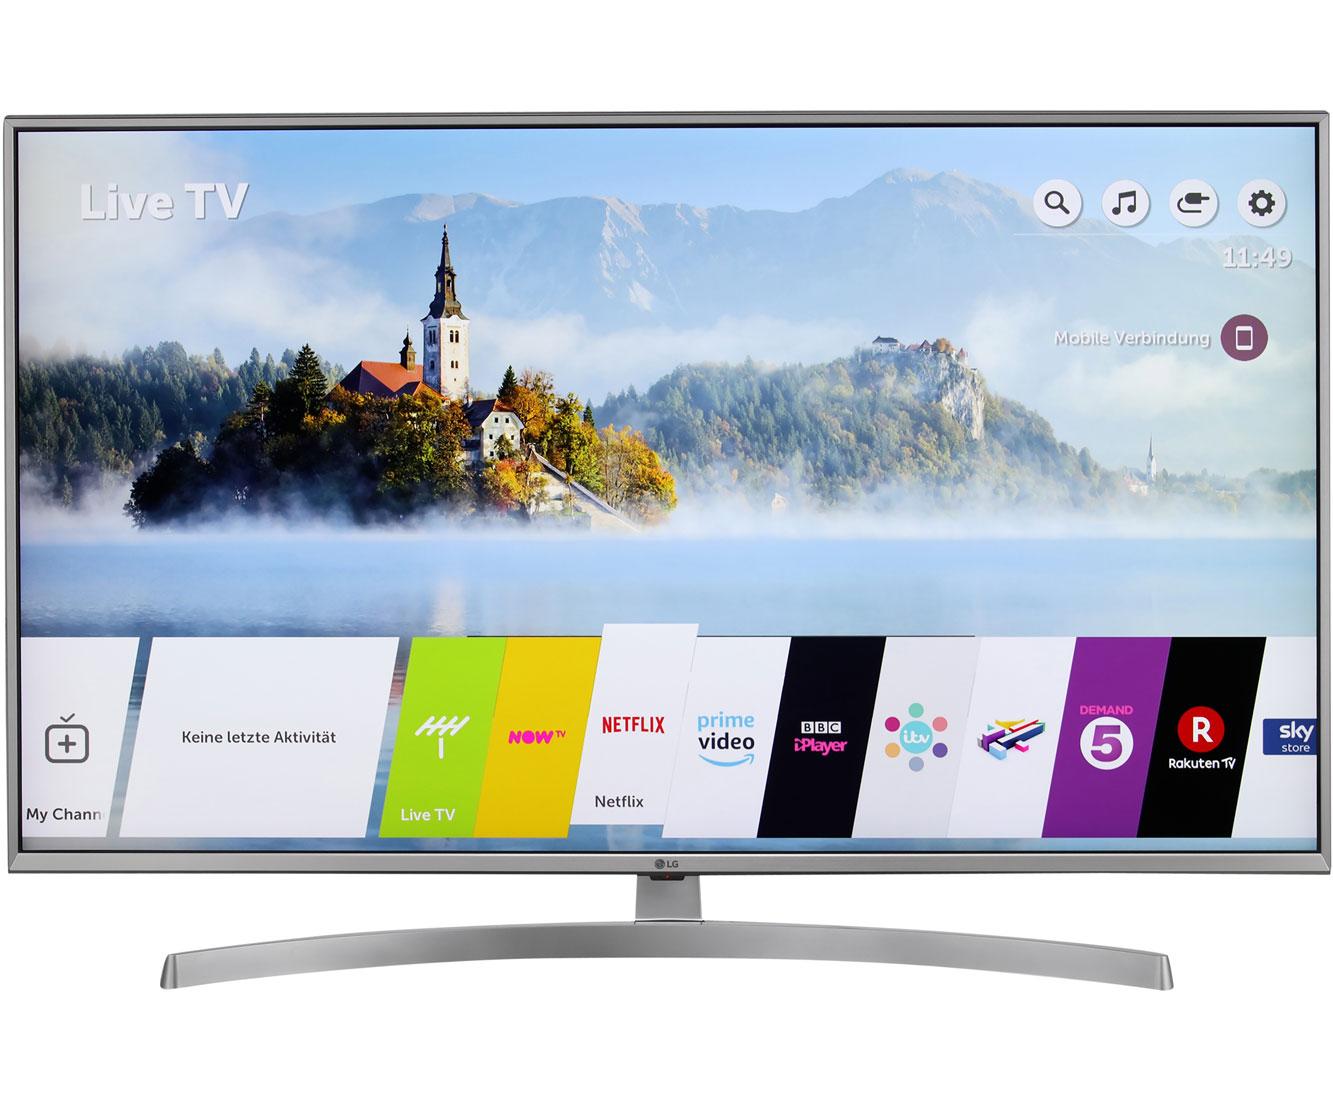 "ao.de: LG 49UK7550LLA, 4K/UHD-Smart TV, 123 cm [49""] - Silber"